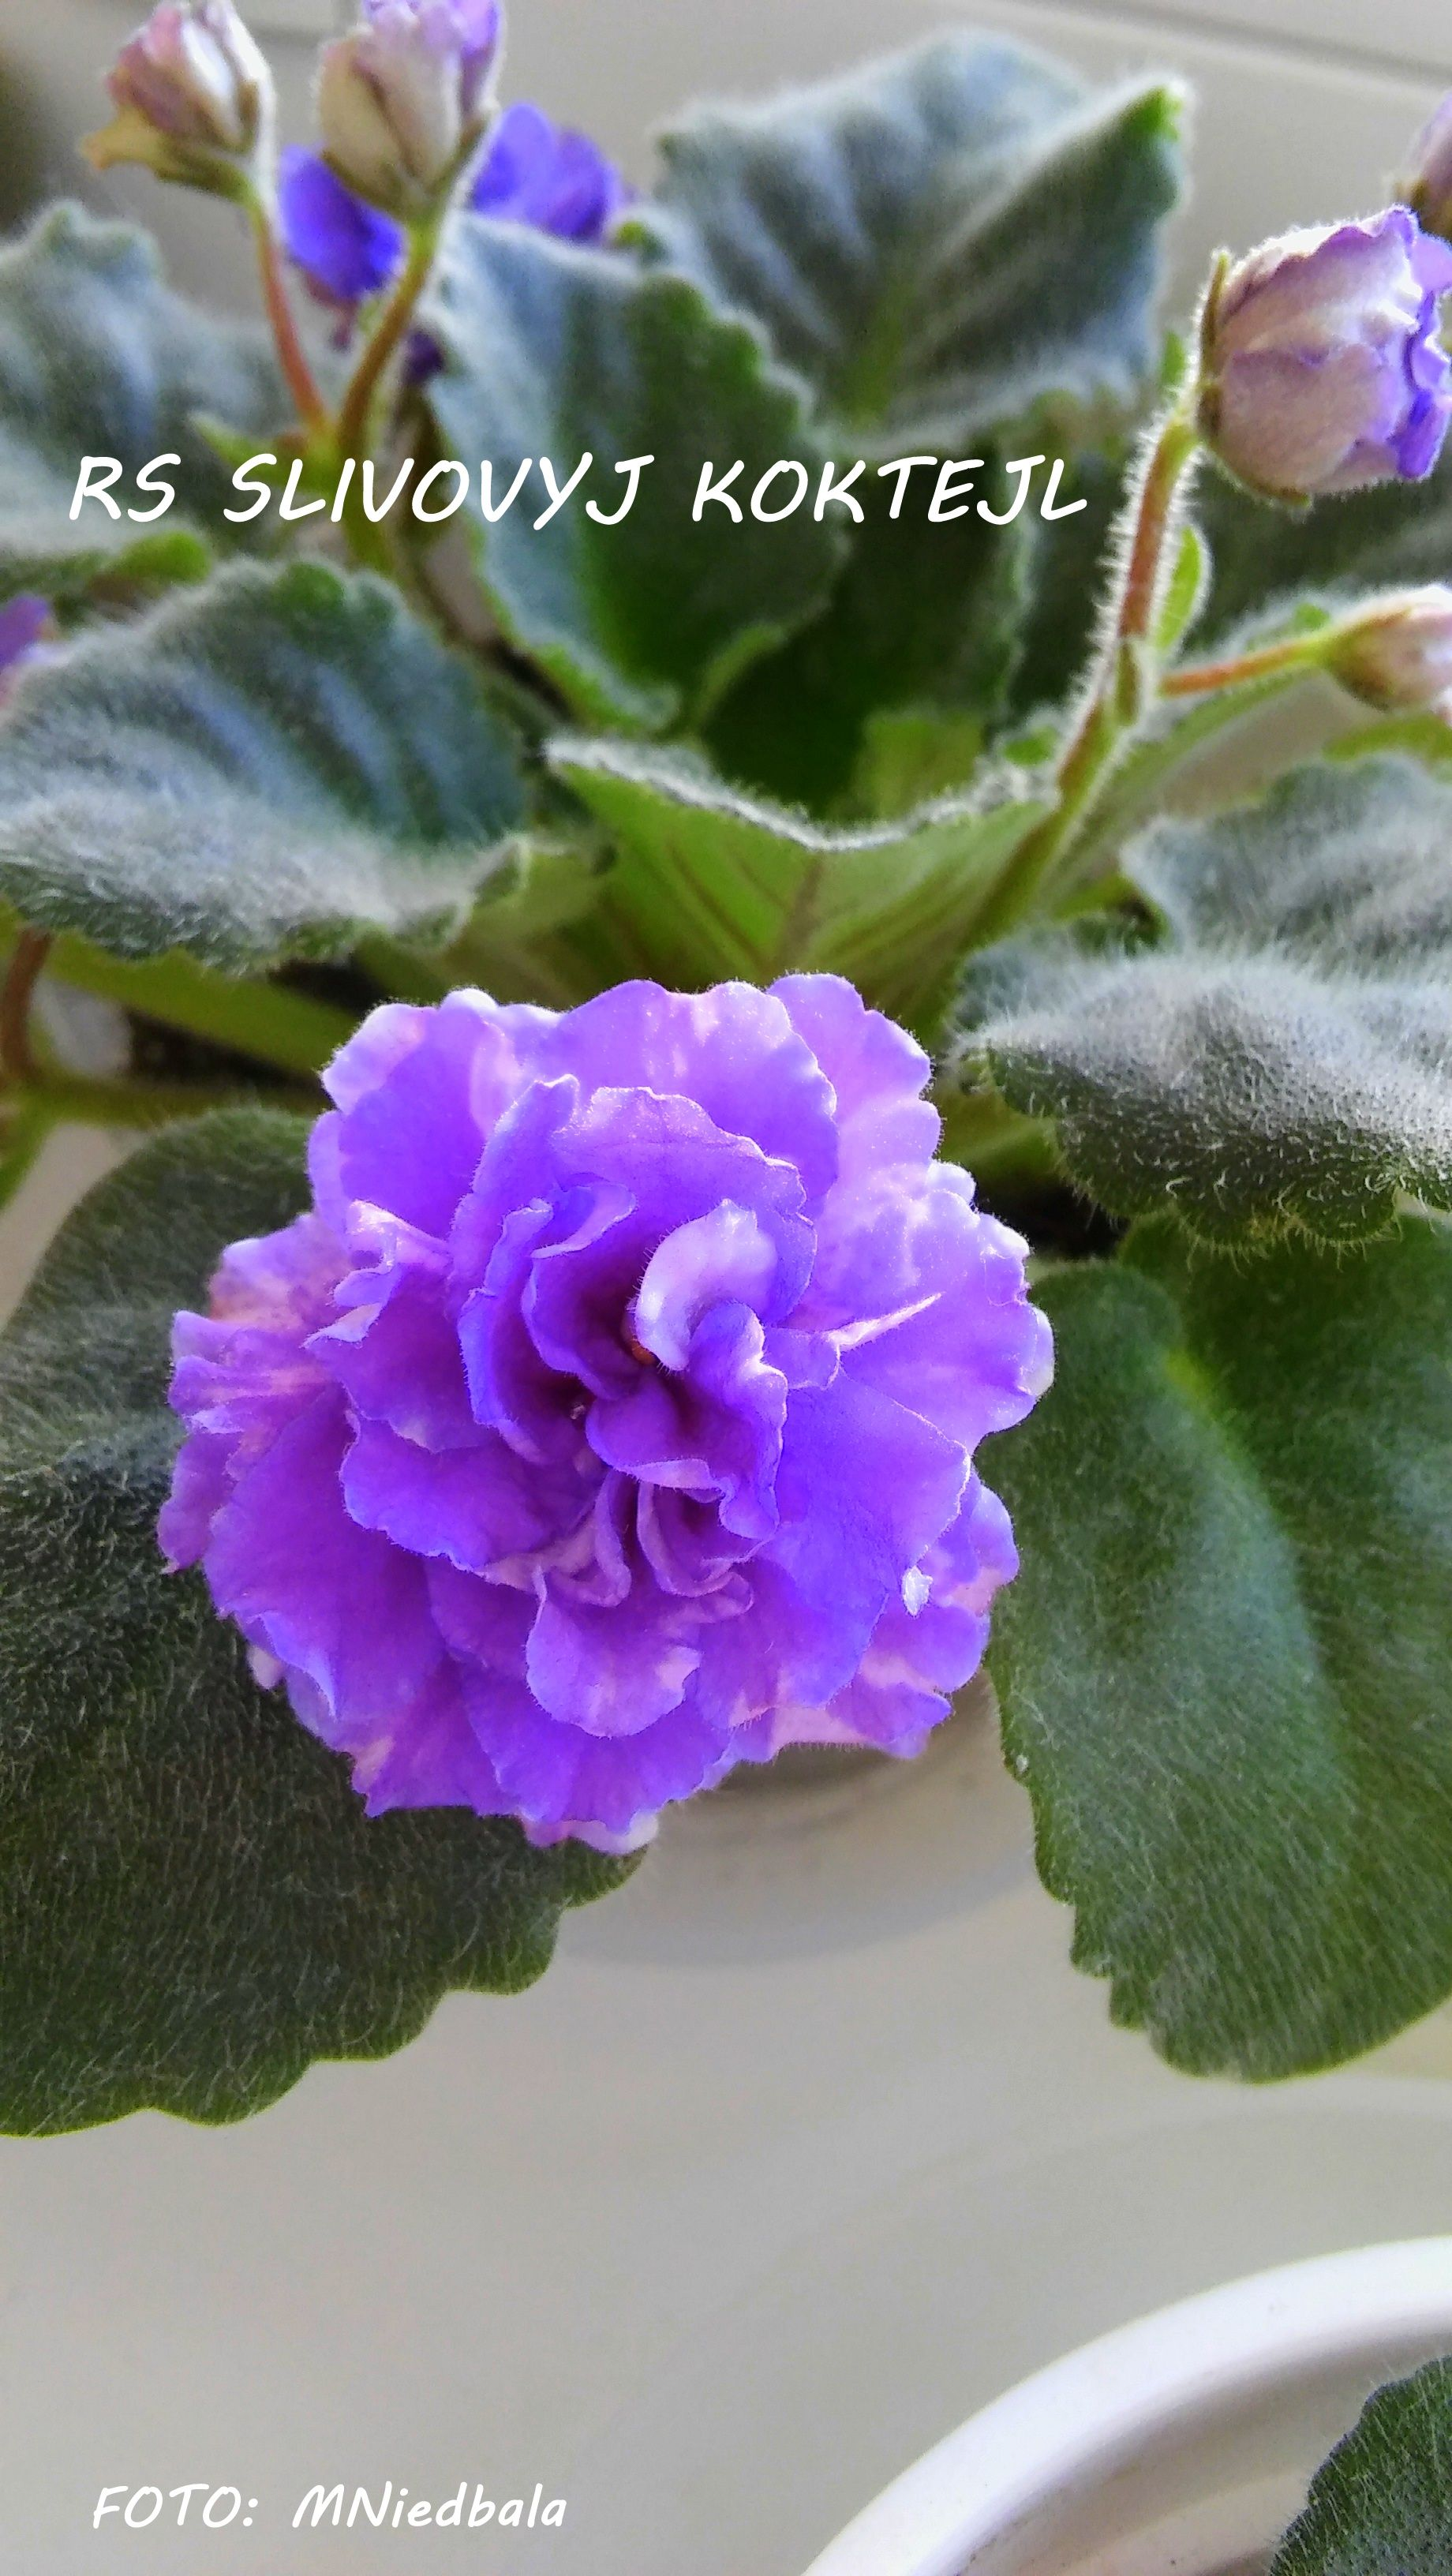 ☘ LE-KARDAMON ☘ African Violet Plant ☘ Plug Russian//Ukrainian Variety NEW 2017